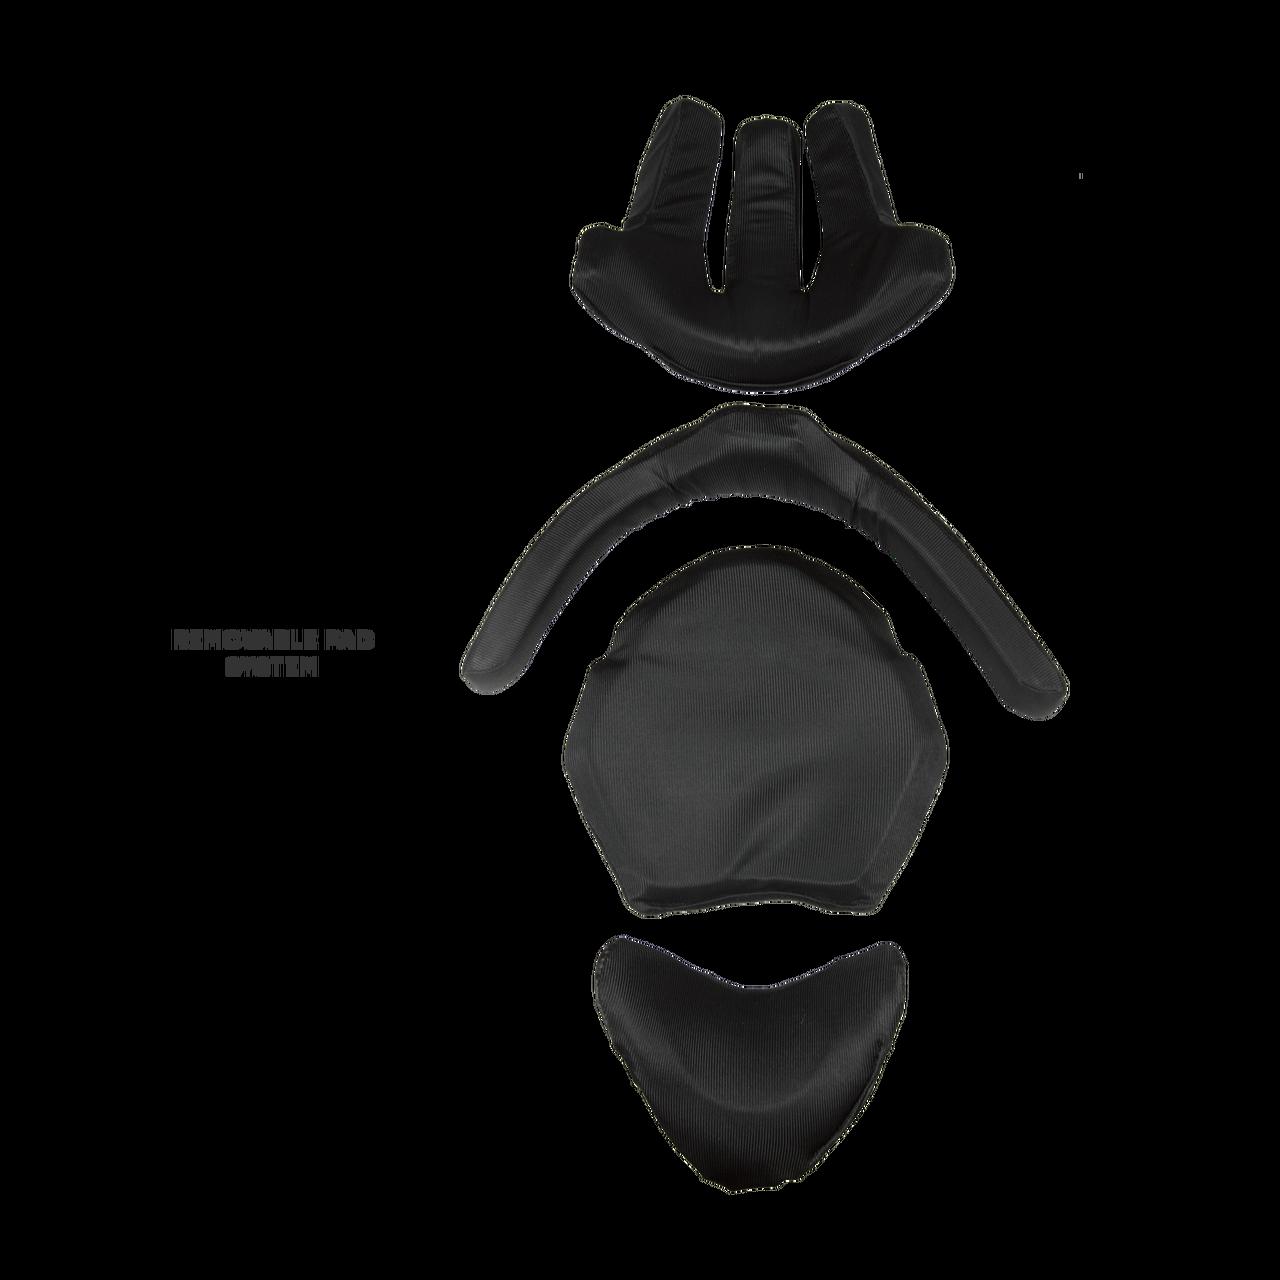 Marucci Mark 1 Catcher's Hockey Style Mask